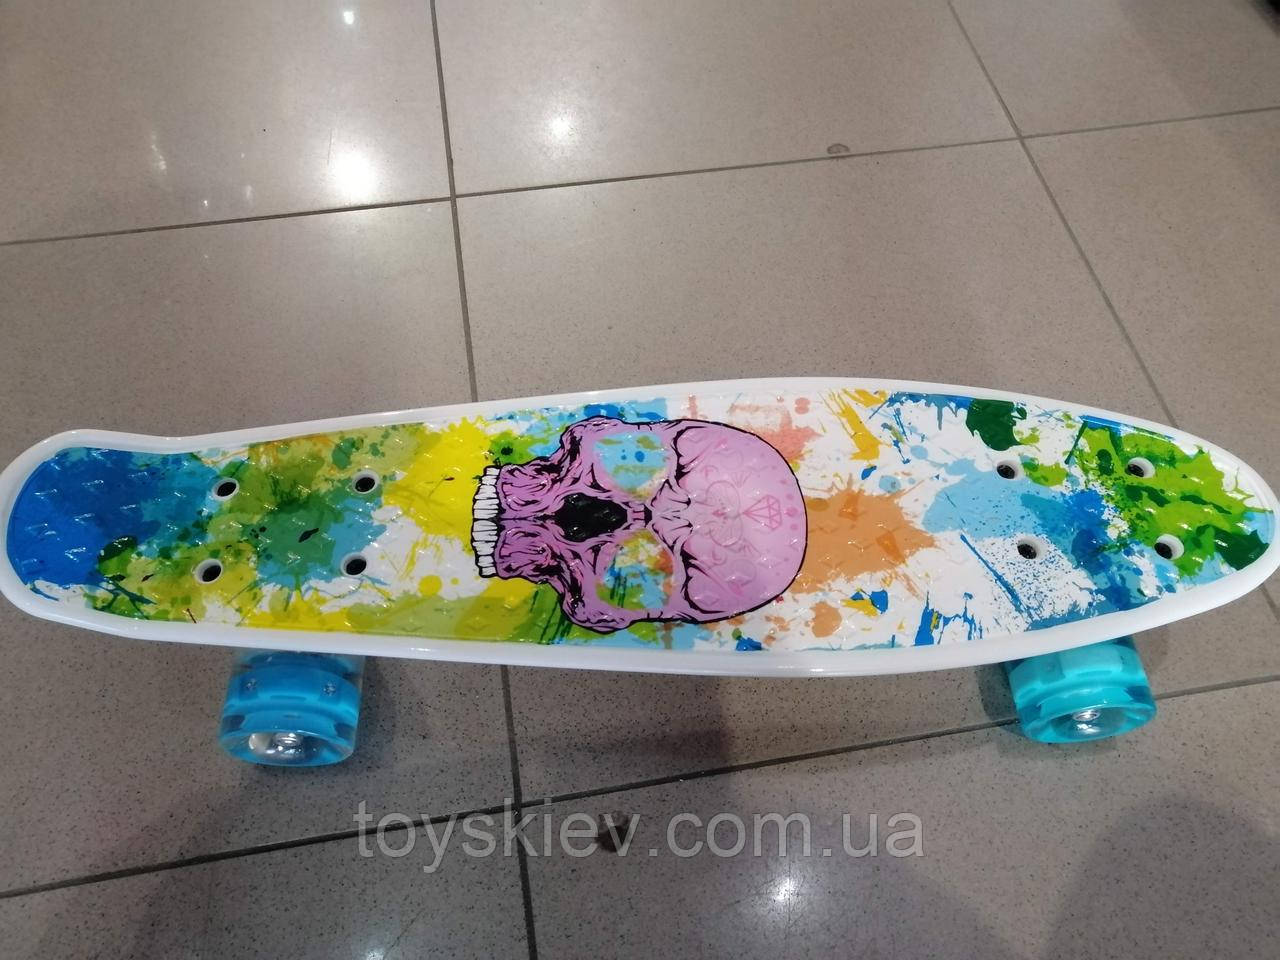 Скейт Пенни борд (Penny board) пениборд с рисунком, светящиеся колёса 29661